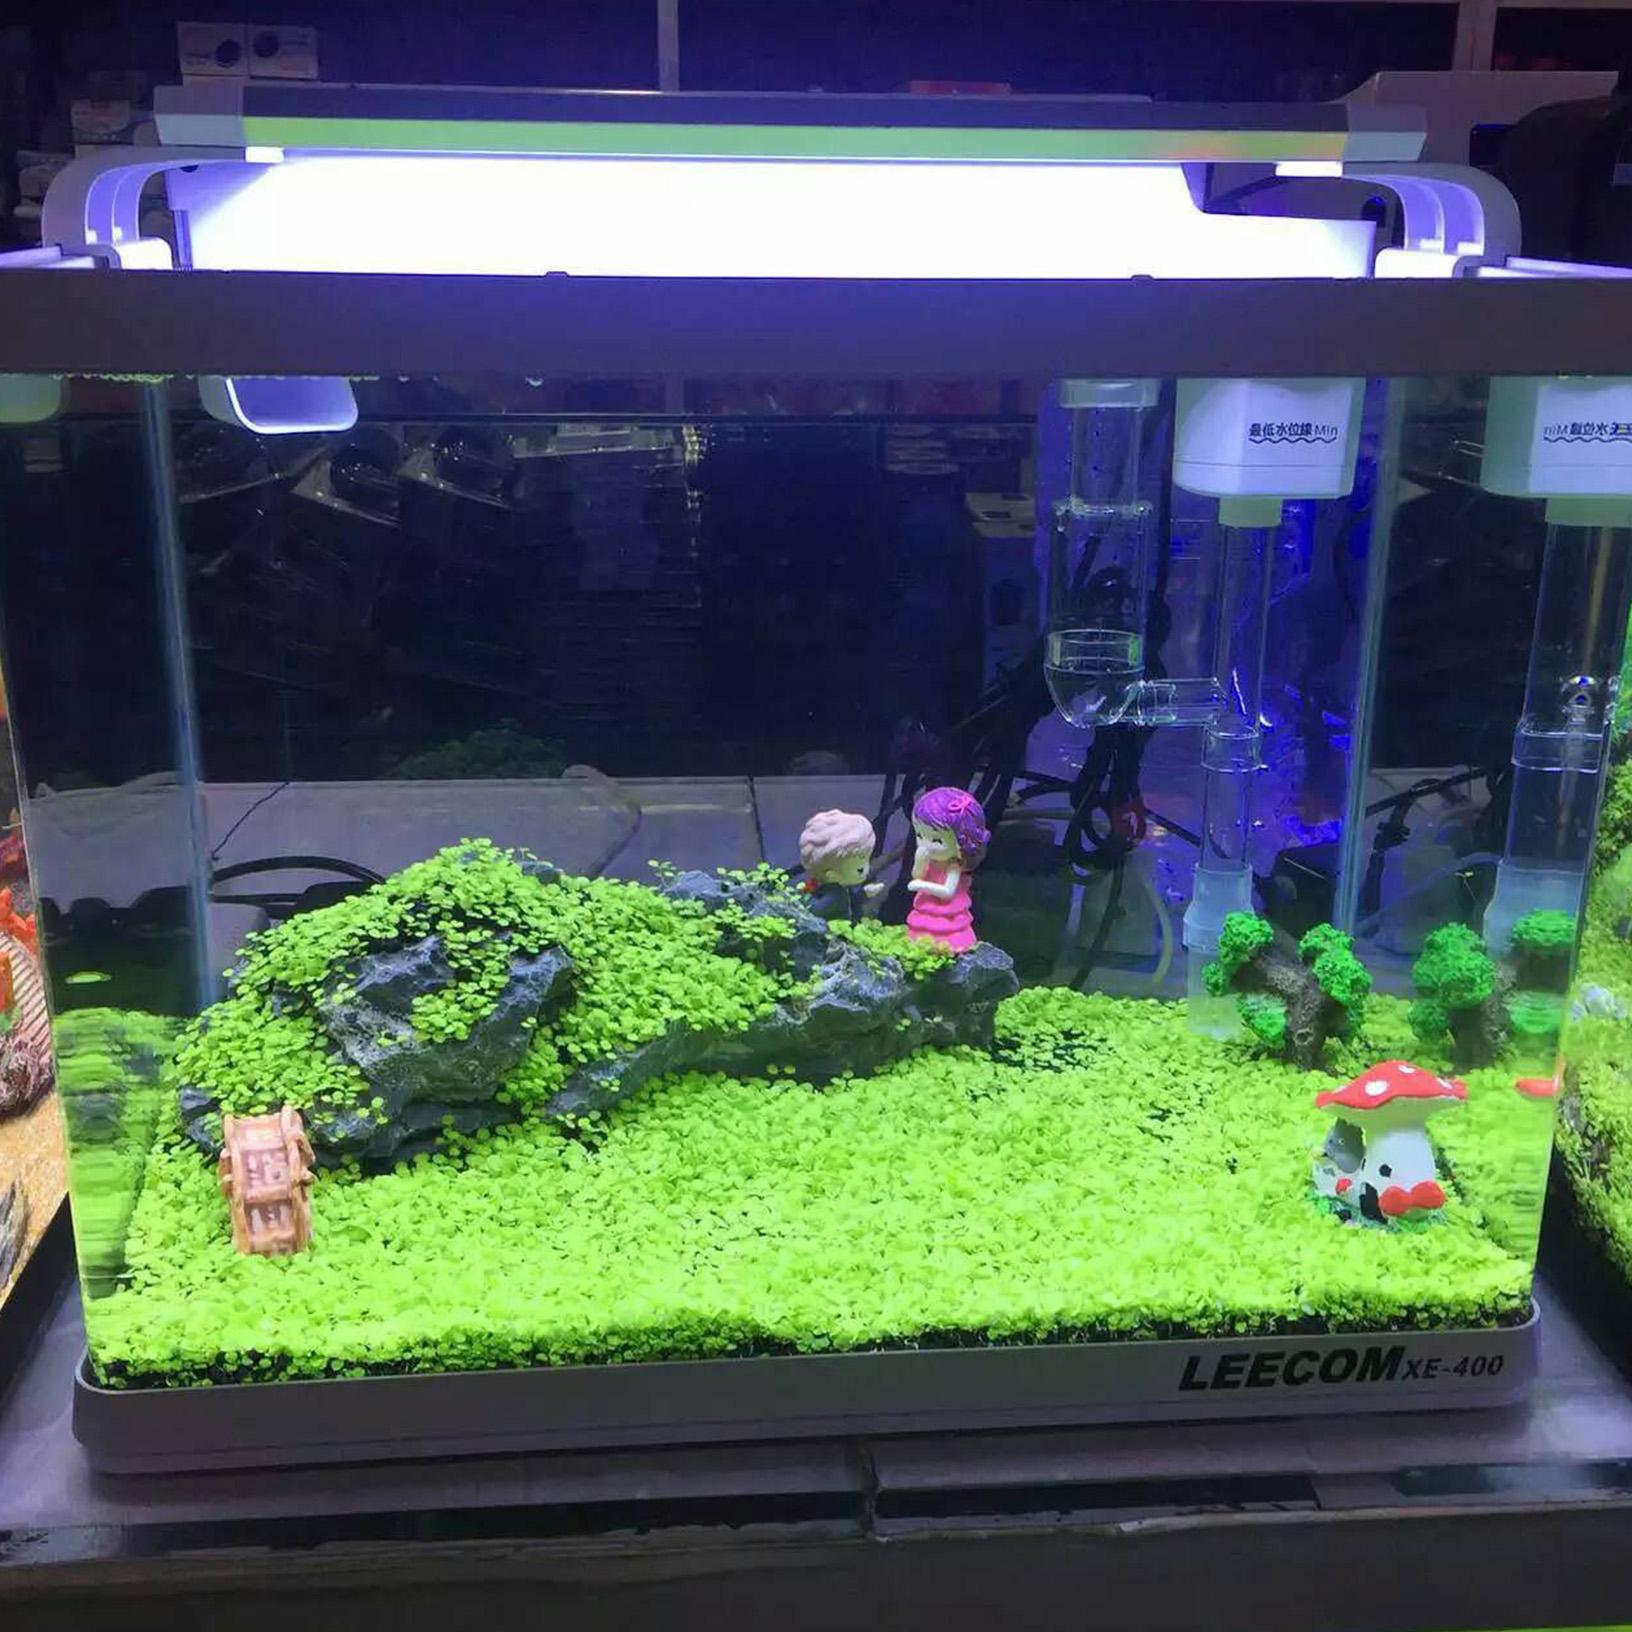 Fish tank aquarium plant decor seed cute aquatic double for Plants for fish tank